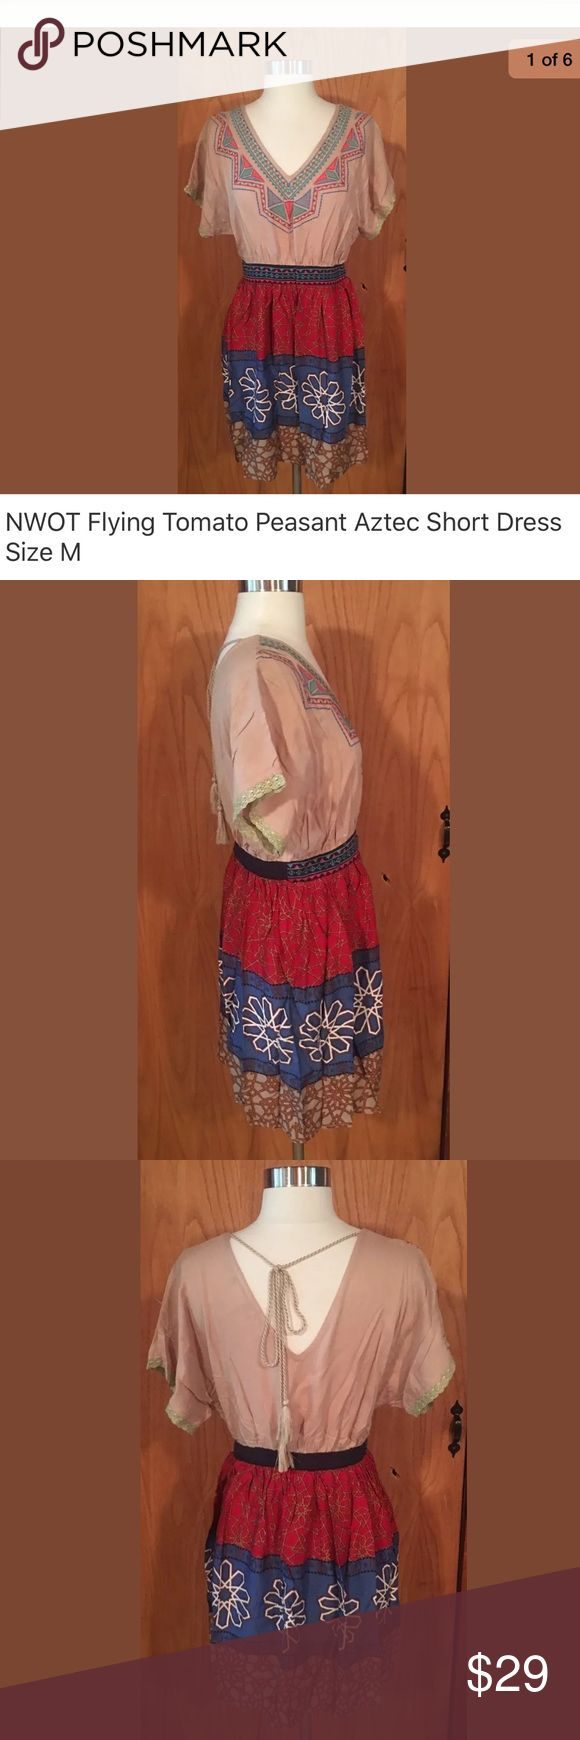 NWOT Flying Tomato Peasant Aztec Short Dress NWOT Flying Tomato Peasant Aztec Short Dress Size M Flying Tomato Dresses